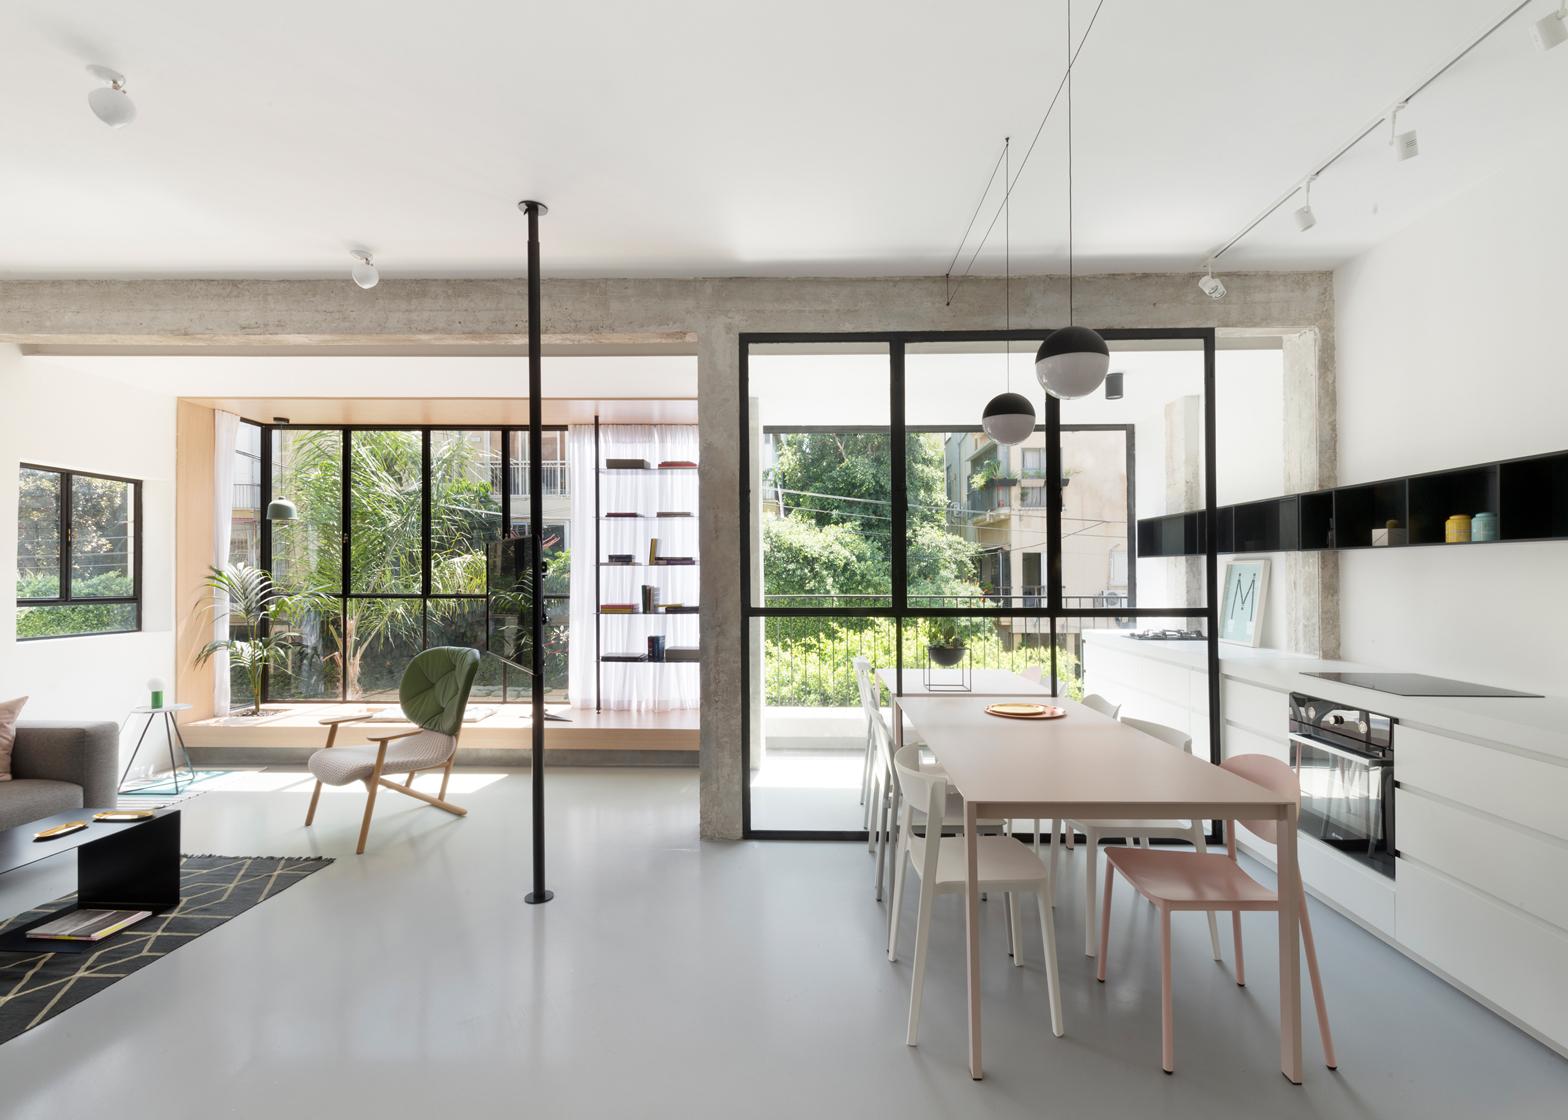 Maayan Zusman and Amir Navron renovate an apartment in Israel